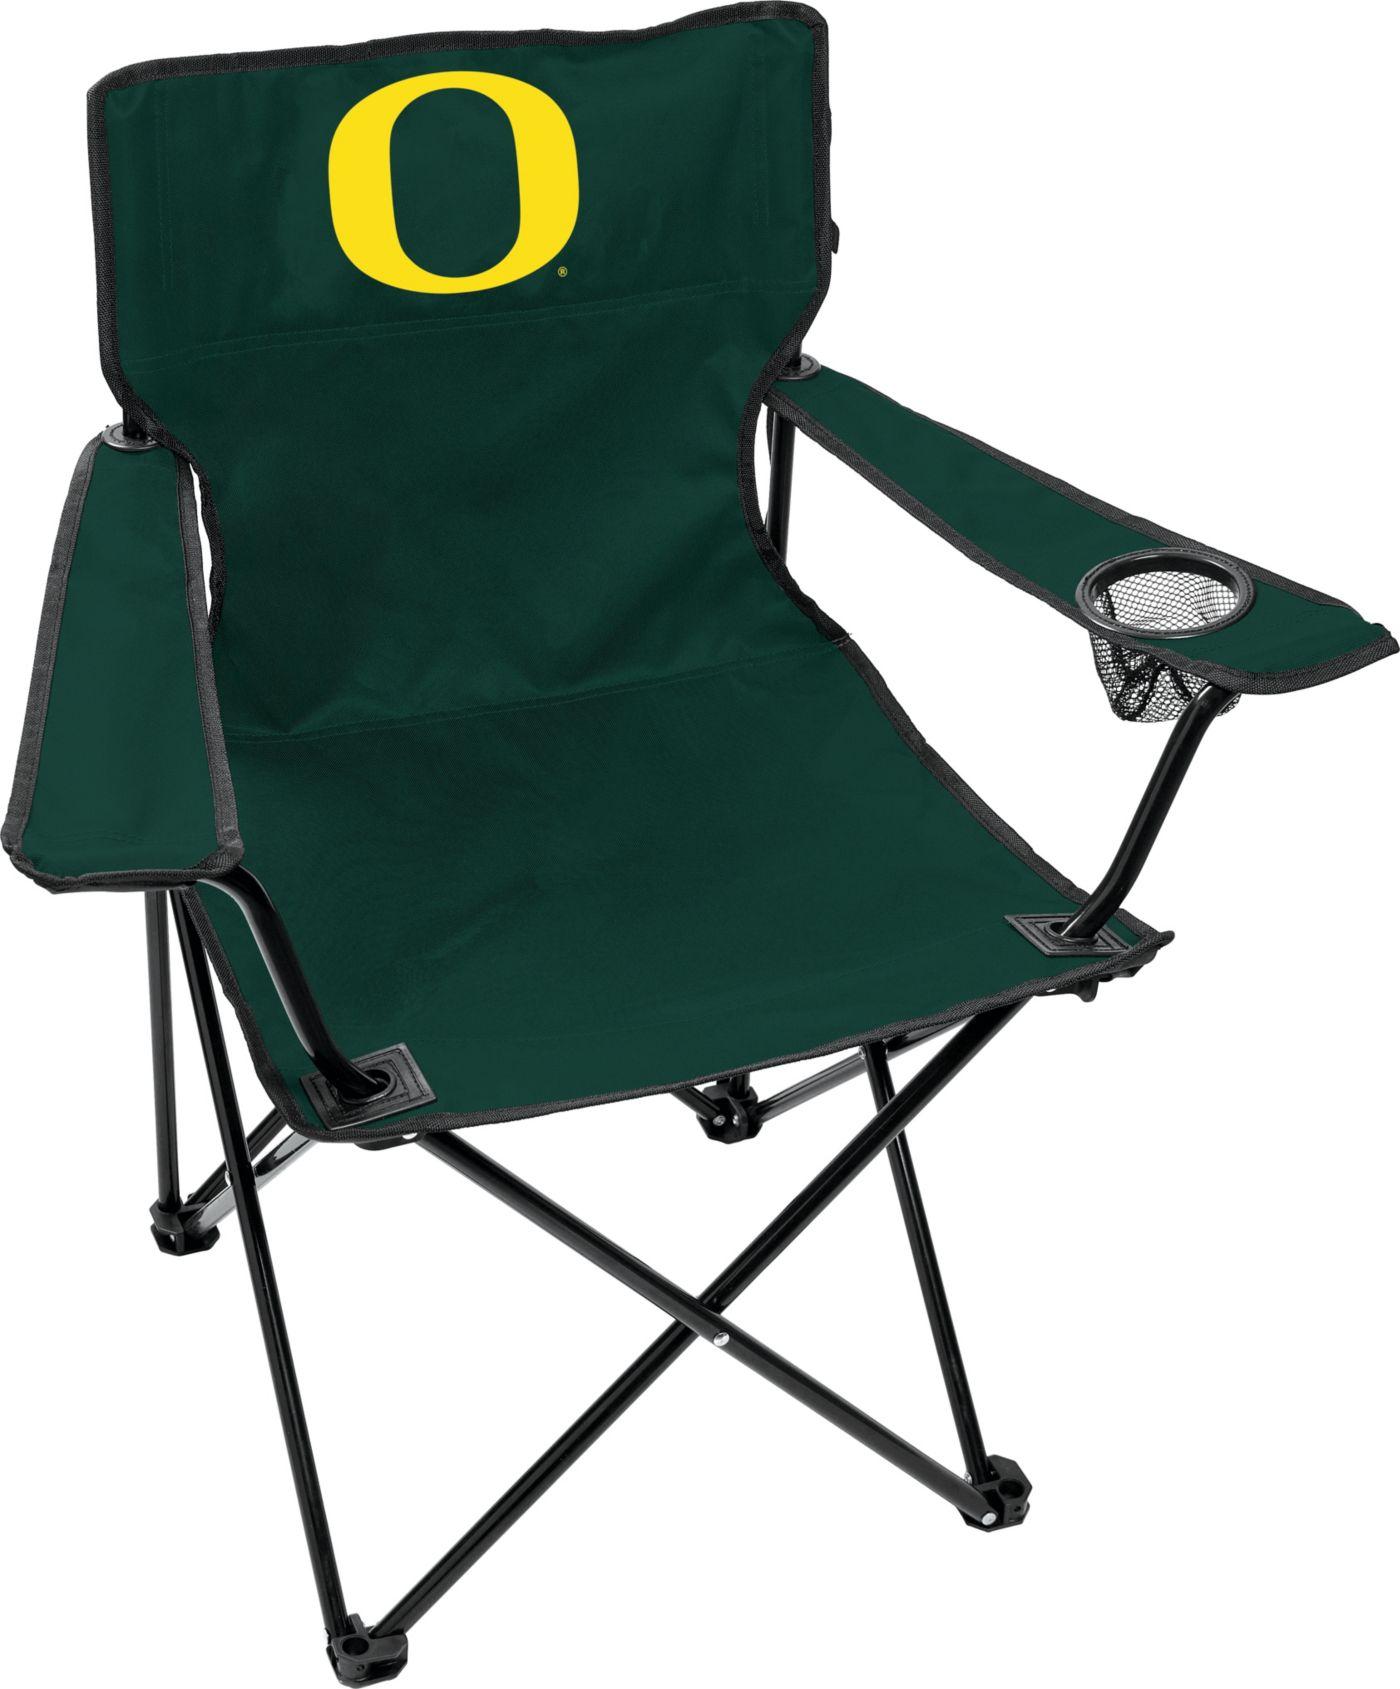 Rawlings Oregon Ducks Game Changer Chair